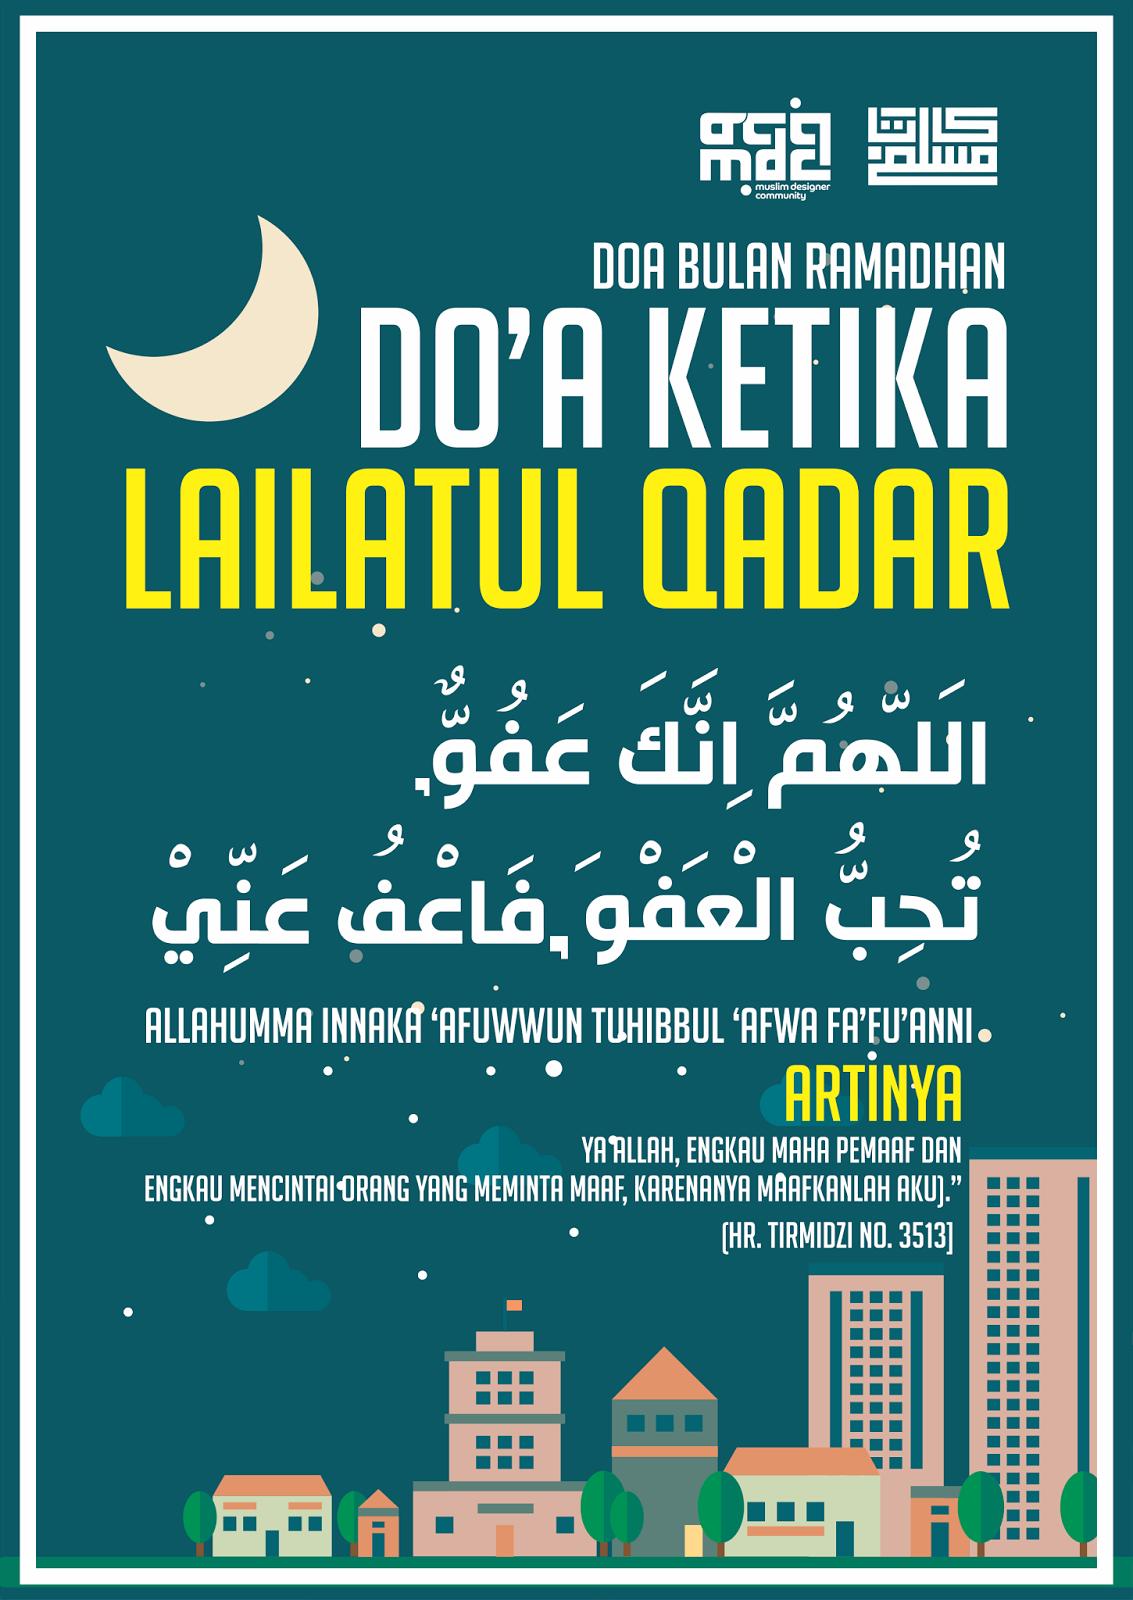 10 Poster Dakwah - Doa Masuk dan Keluar Masjid CDR File CorelDraw Free